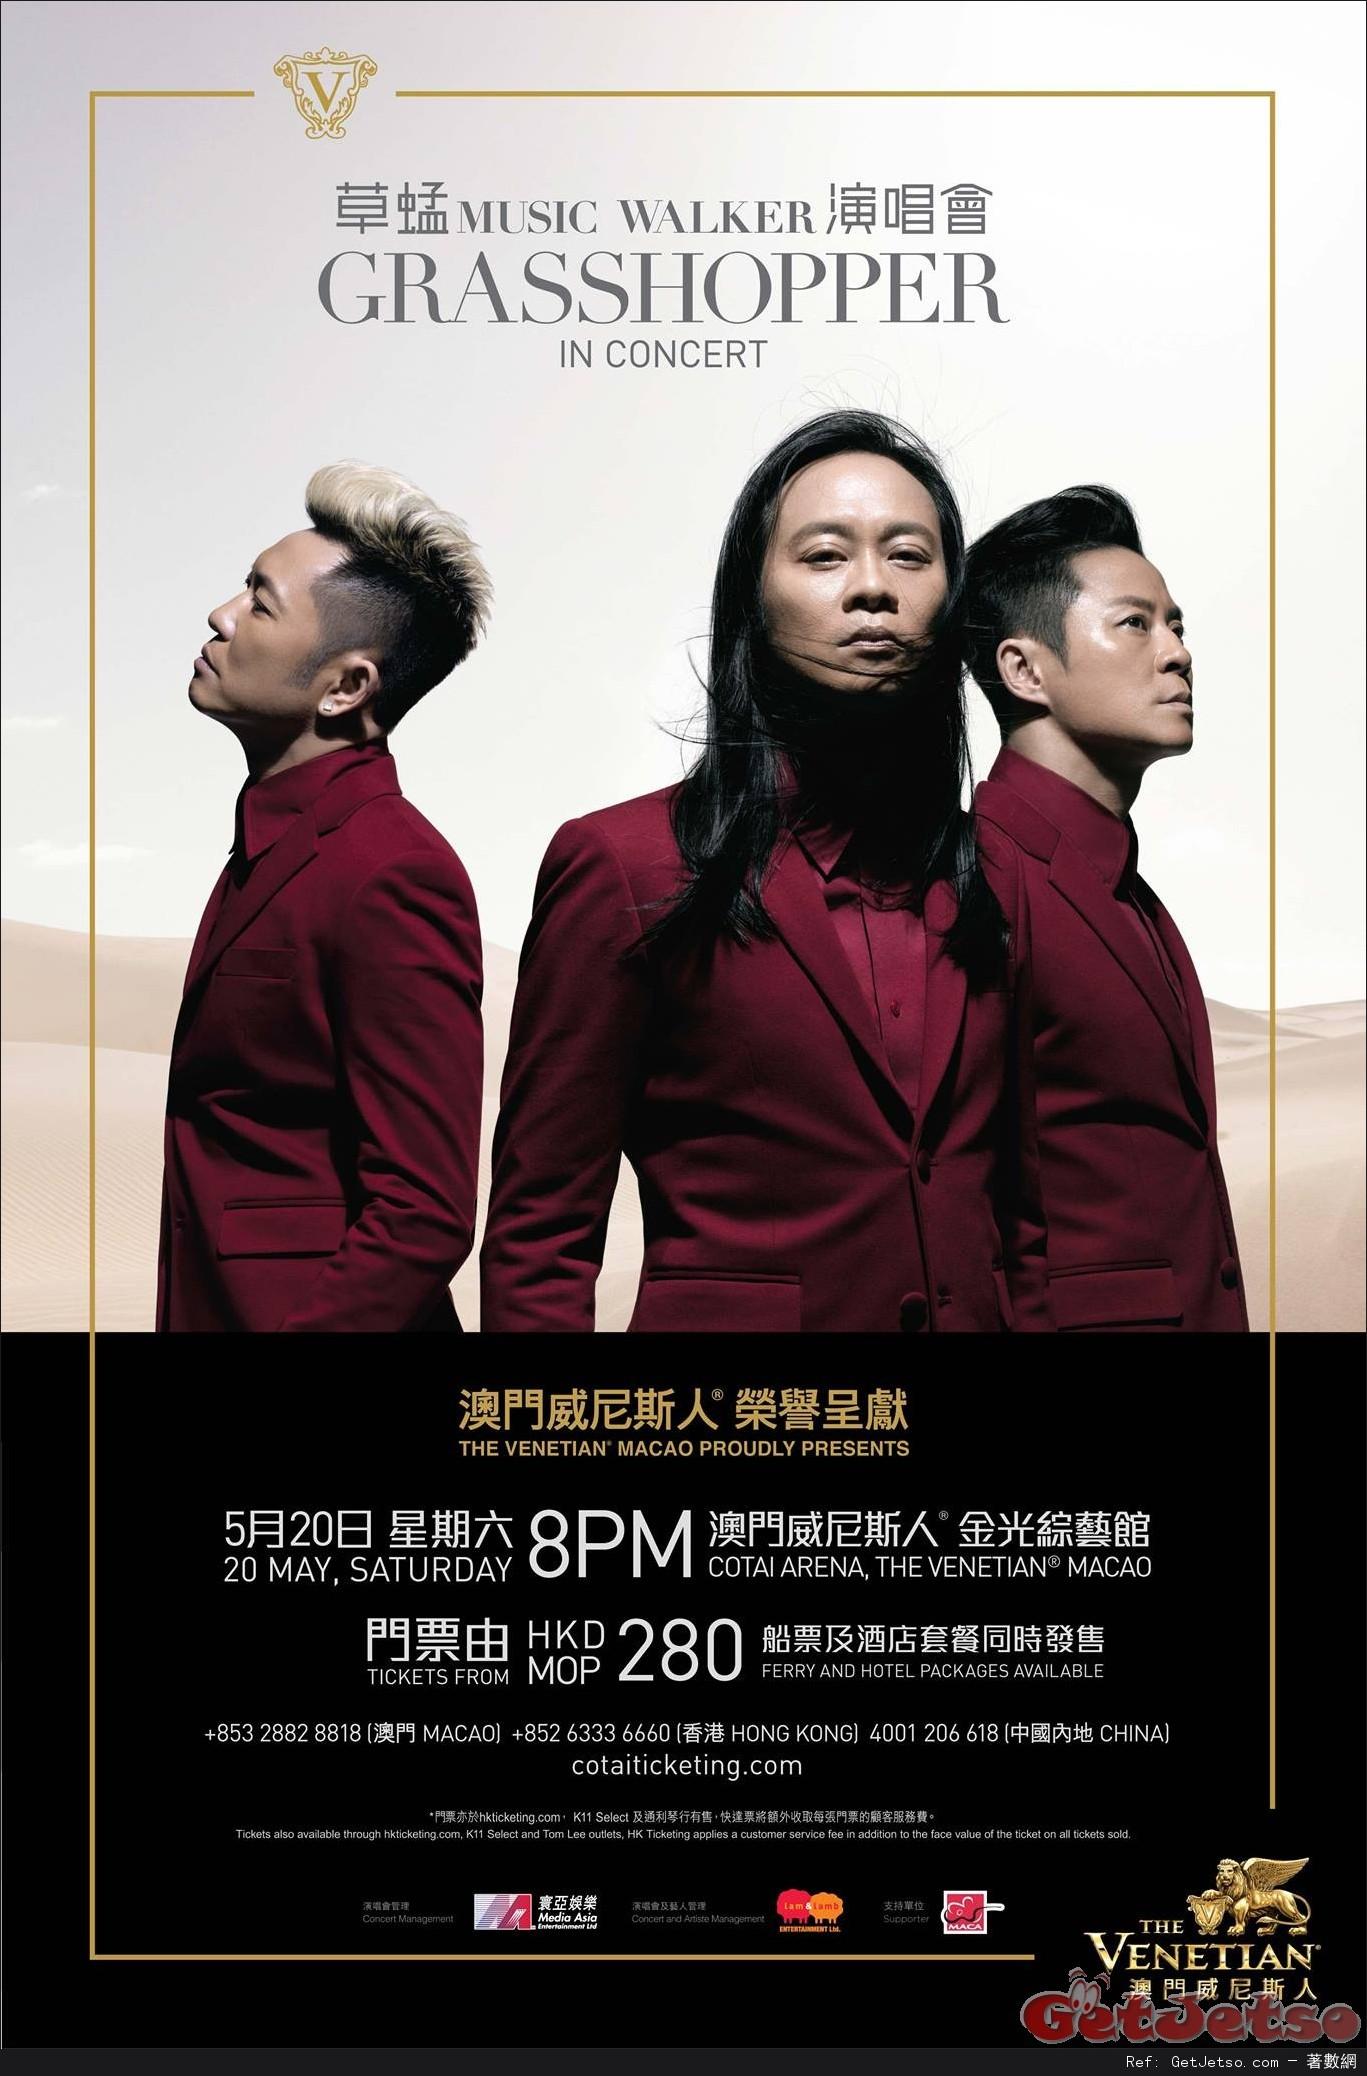 Music Walker 草蜢演唱會澳門站門票公開發售(17年4月25日起)圖片1